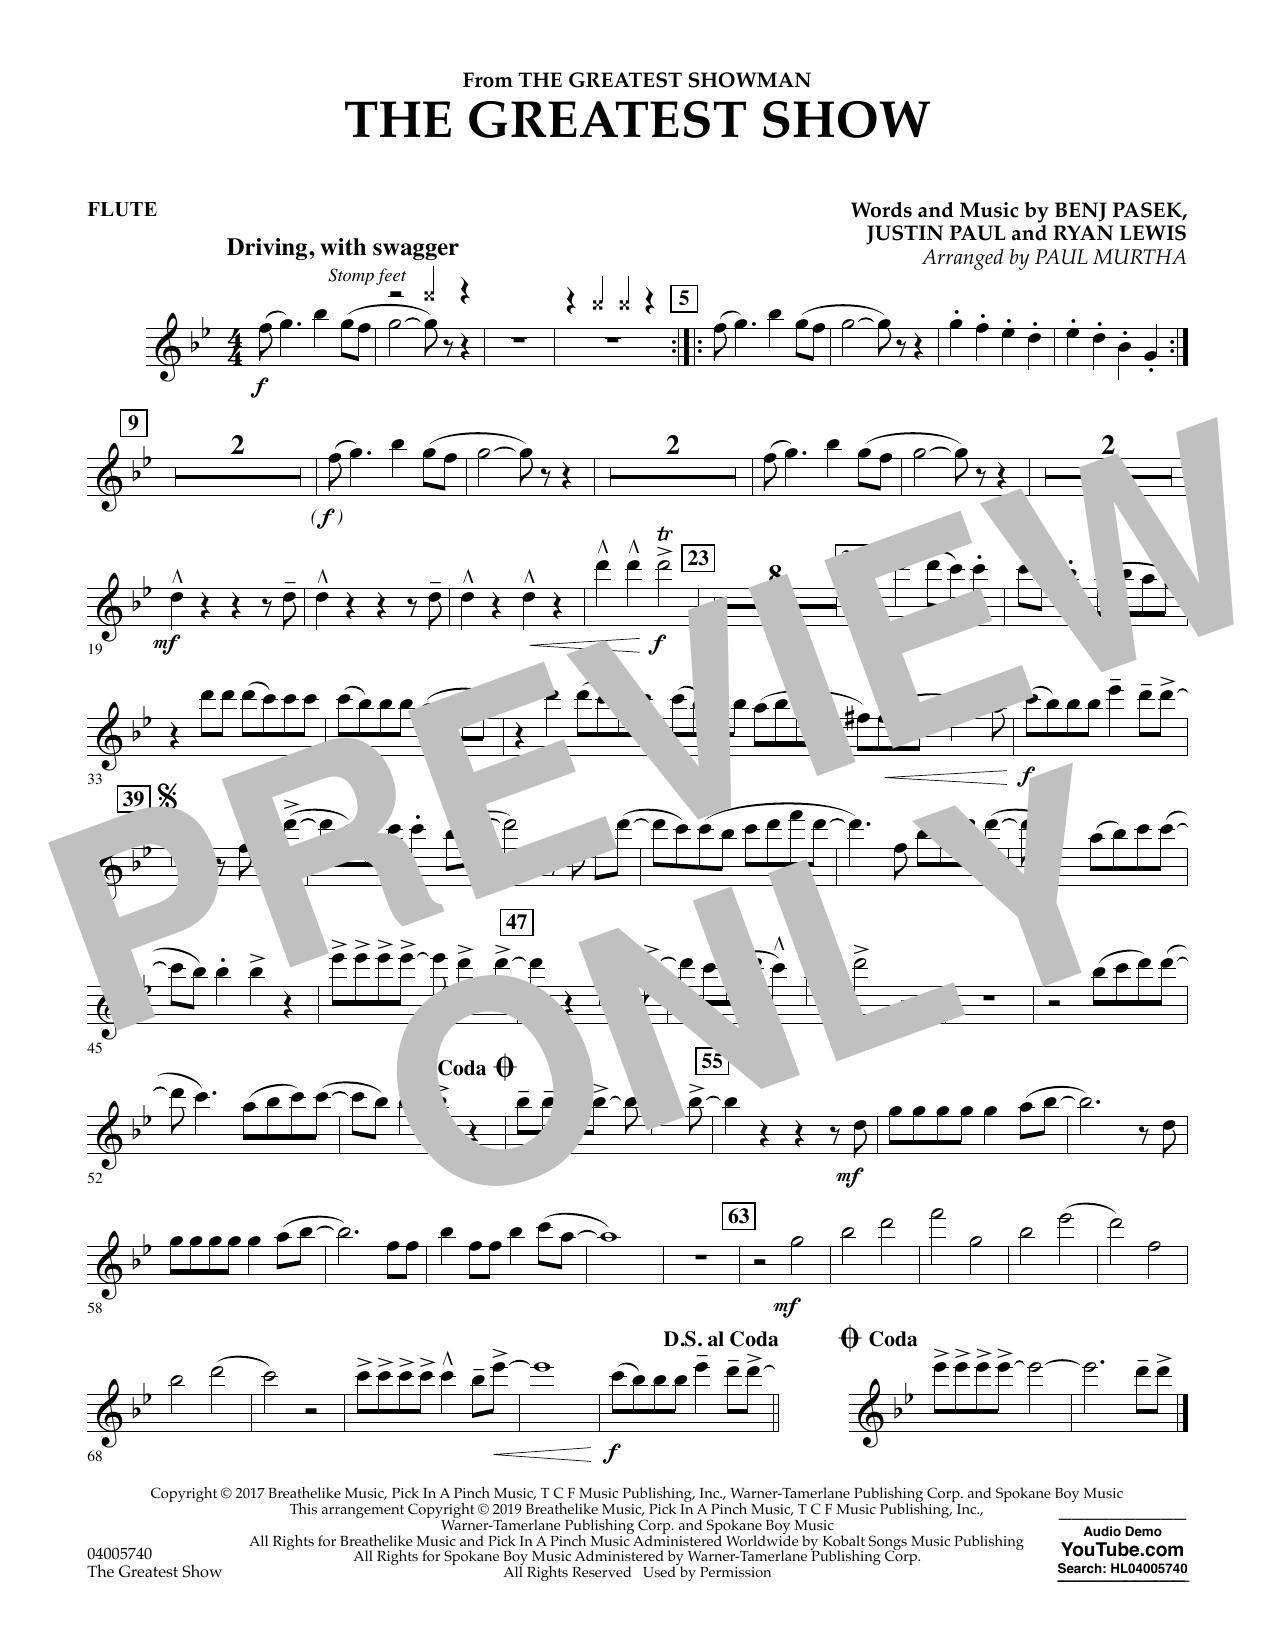 The Greatest Show  (arr. Paul Murtha) - Flute (Concert Band)